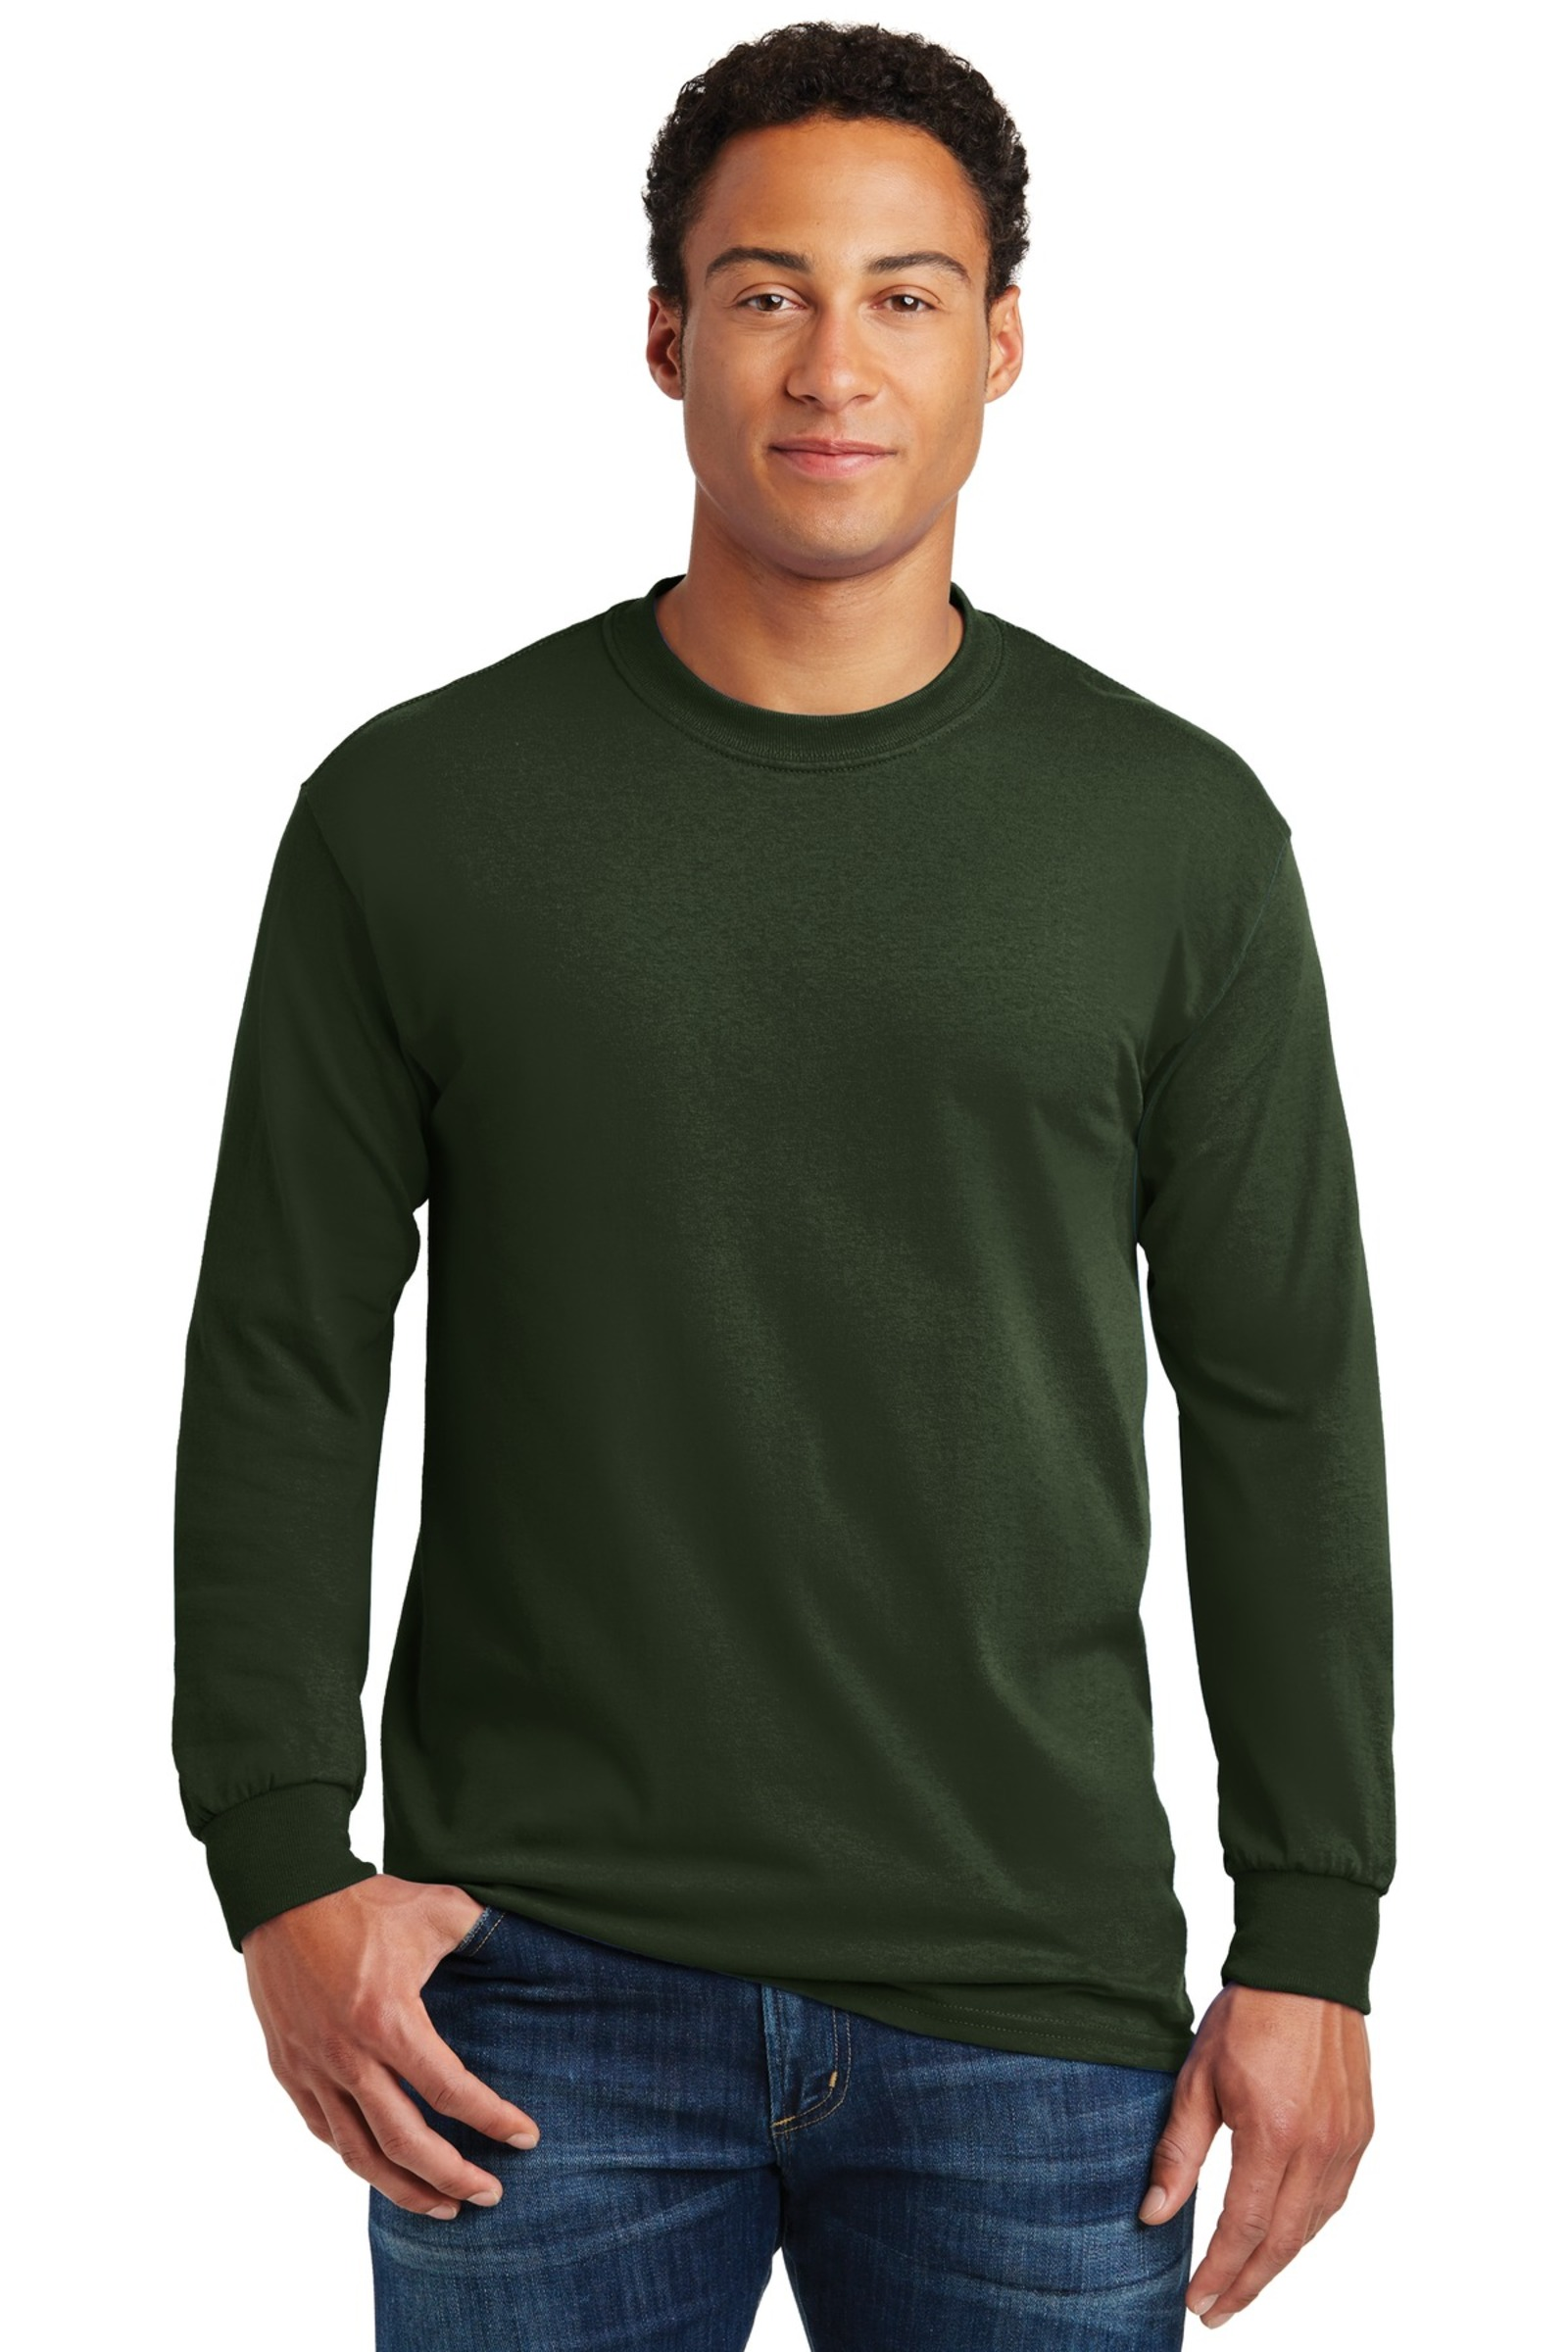 Gildan Printed Men's Heavy Cotton Long Sleeve T-Shirt